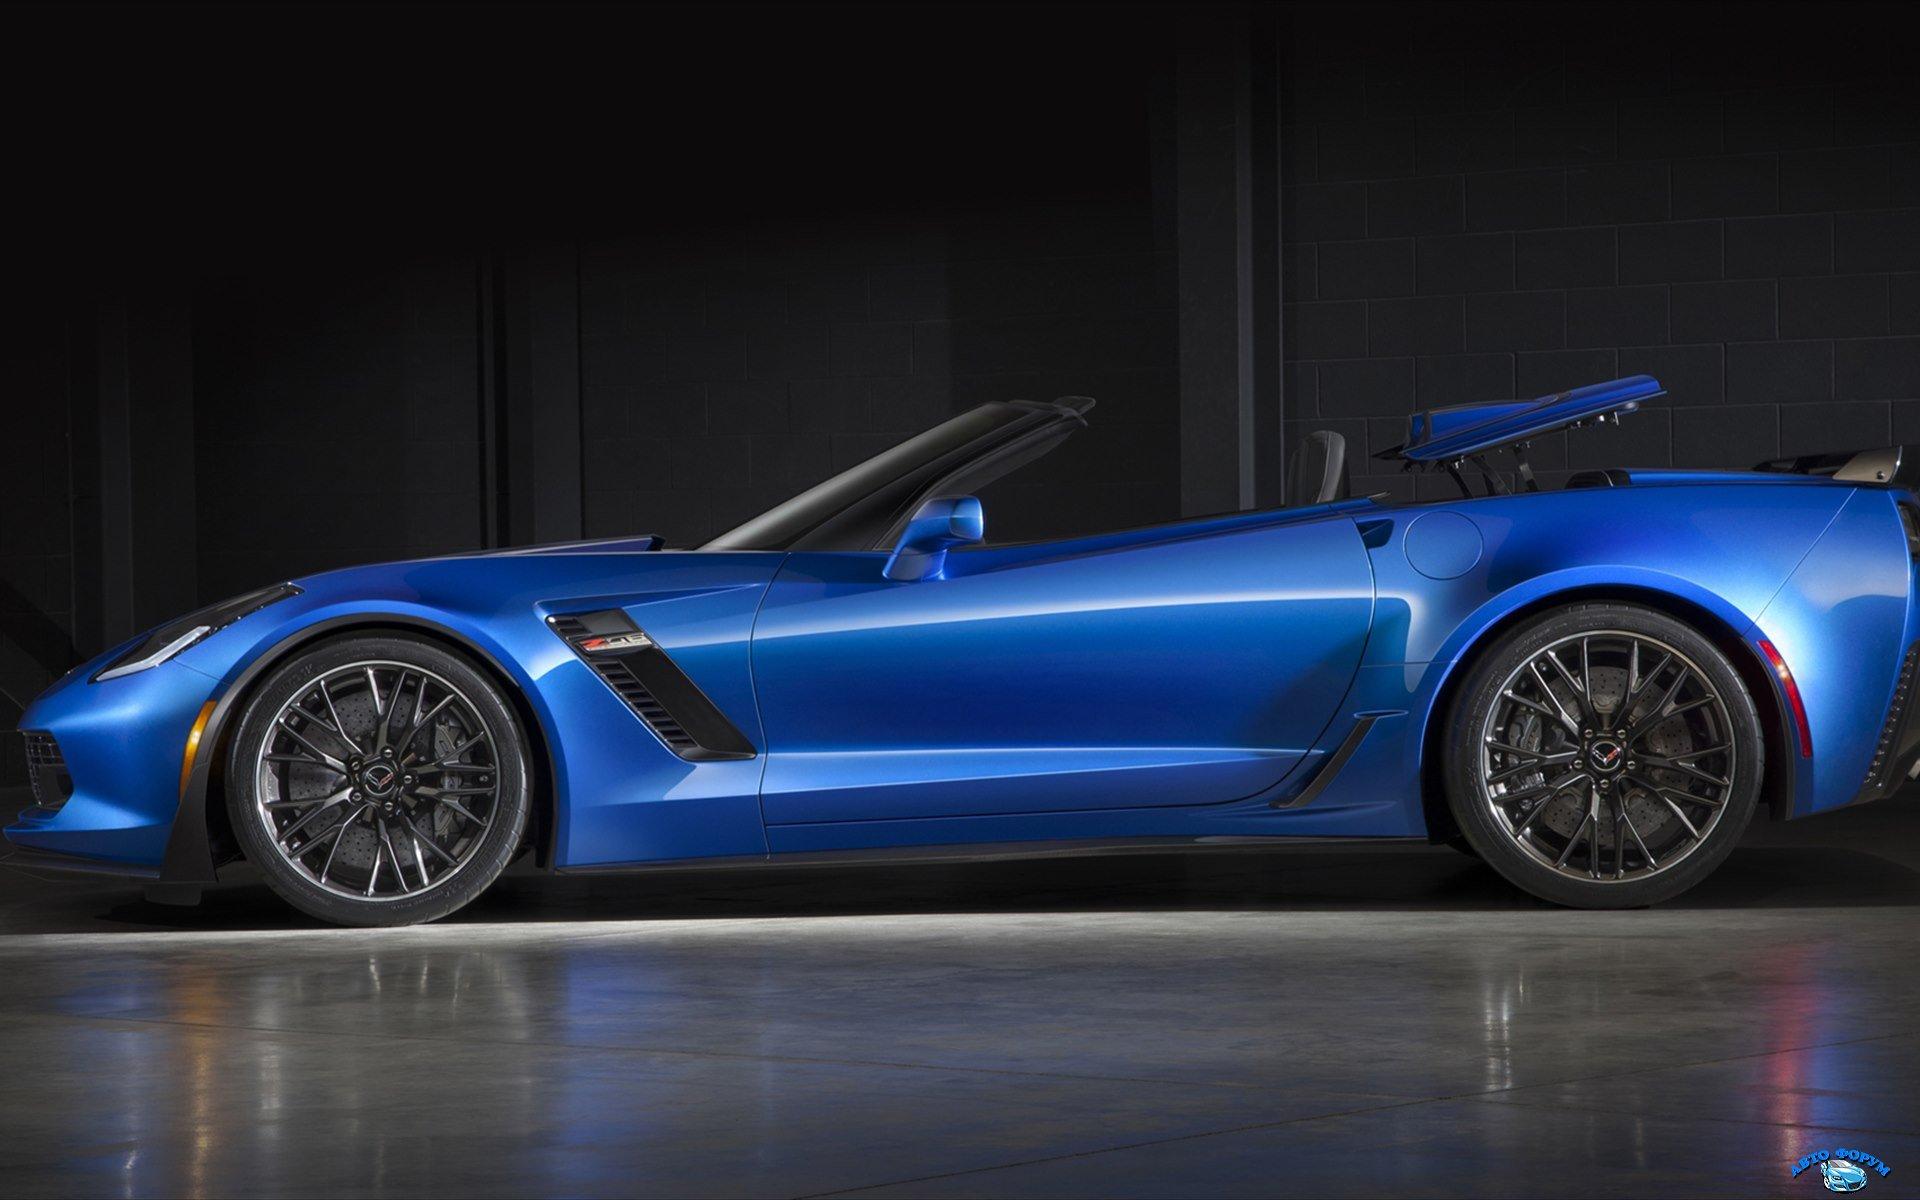 Chevrolet-Corvette-Z06-Convertible-2015-widescreen-13.jpg